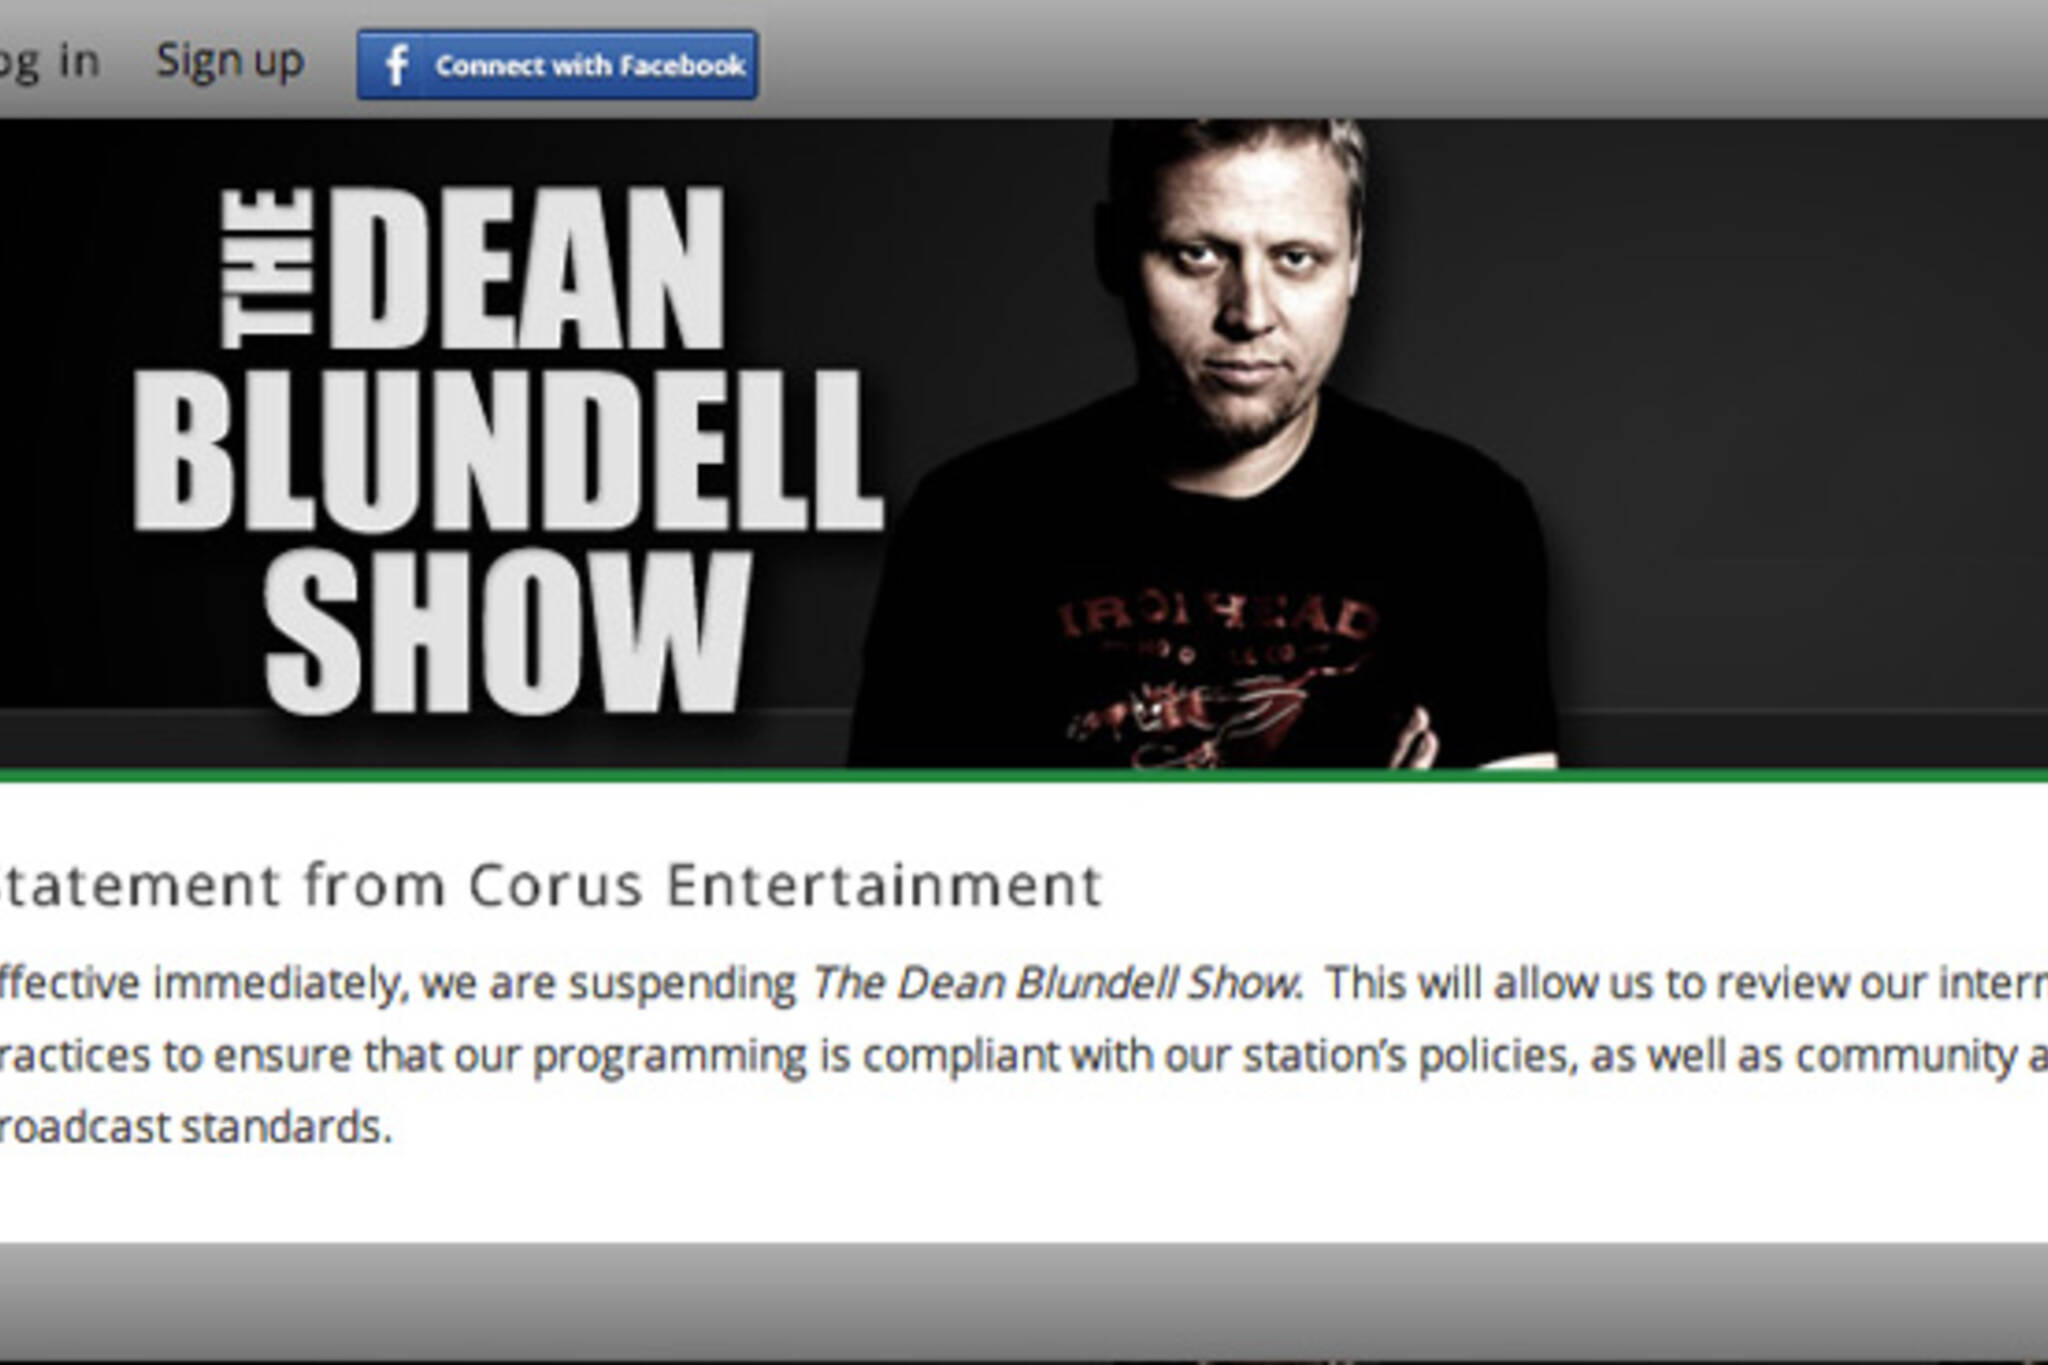 Dean Blundell Show